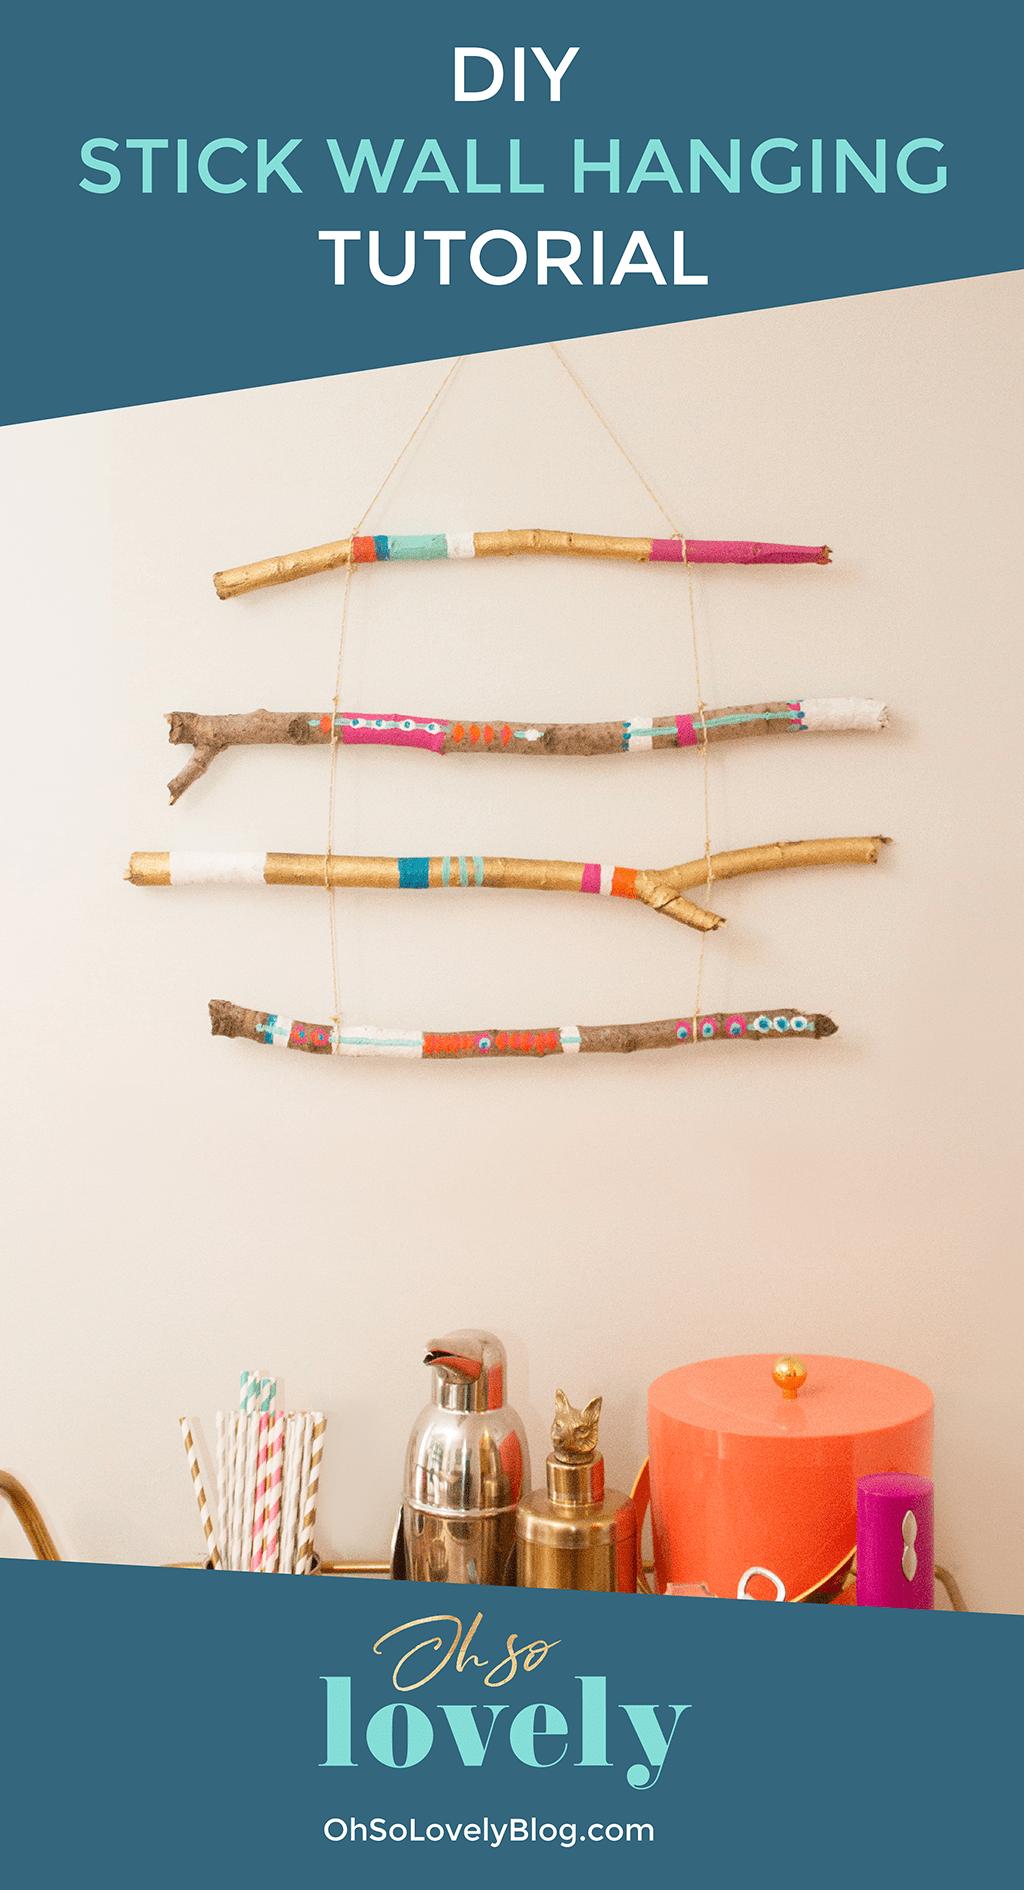 DIY stick wall hanging